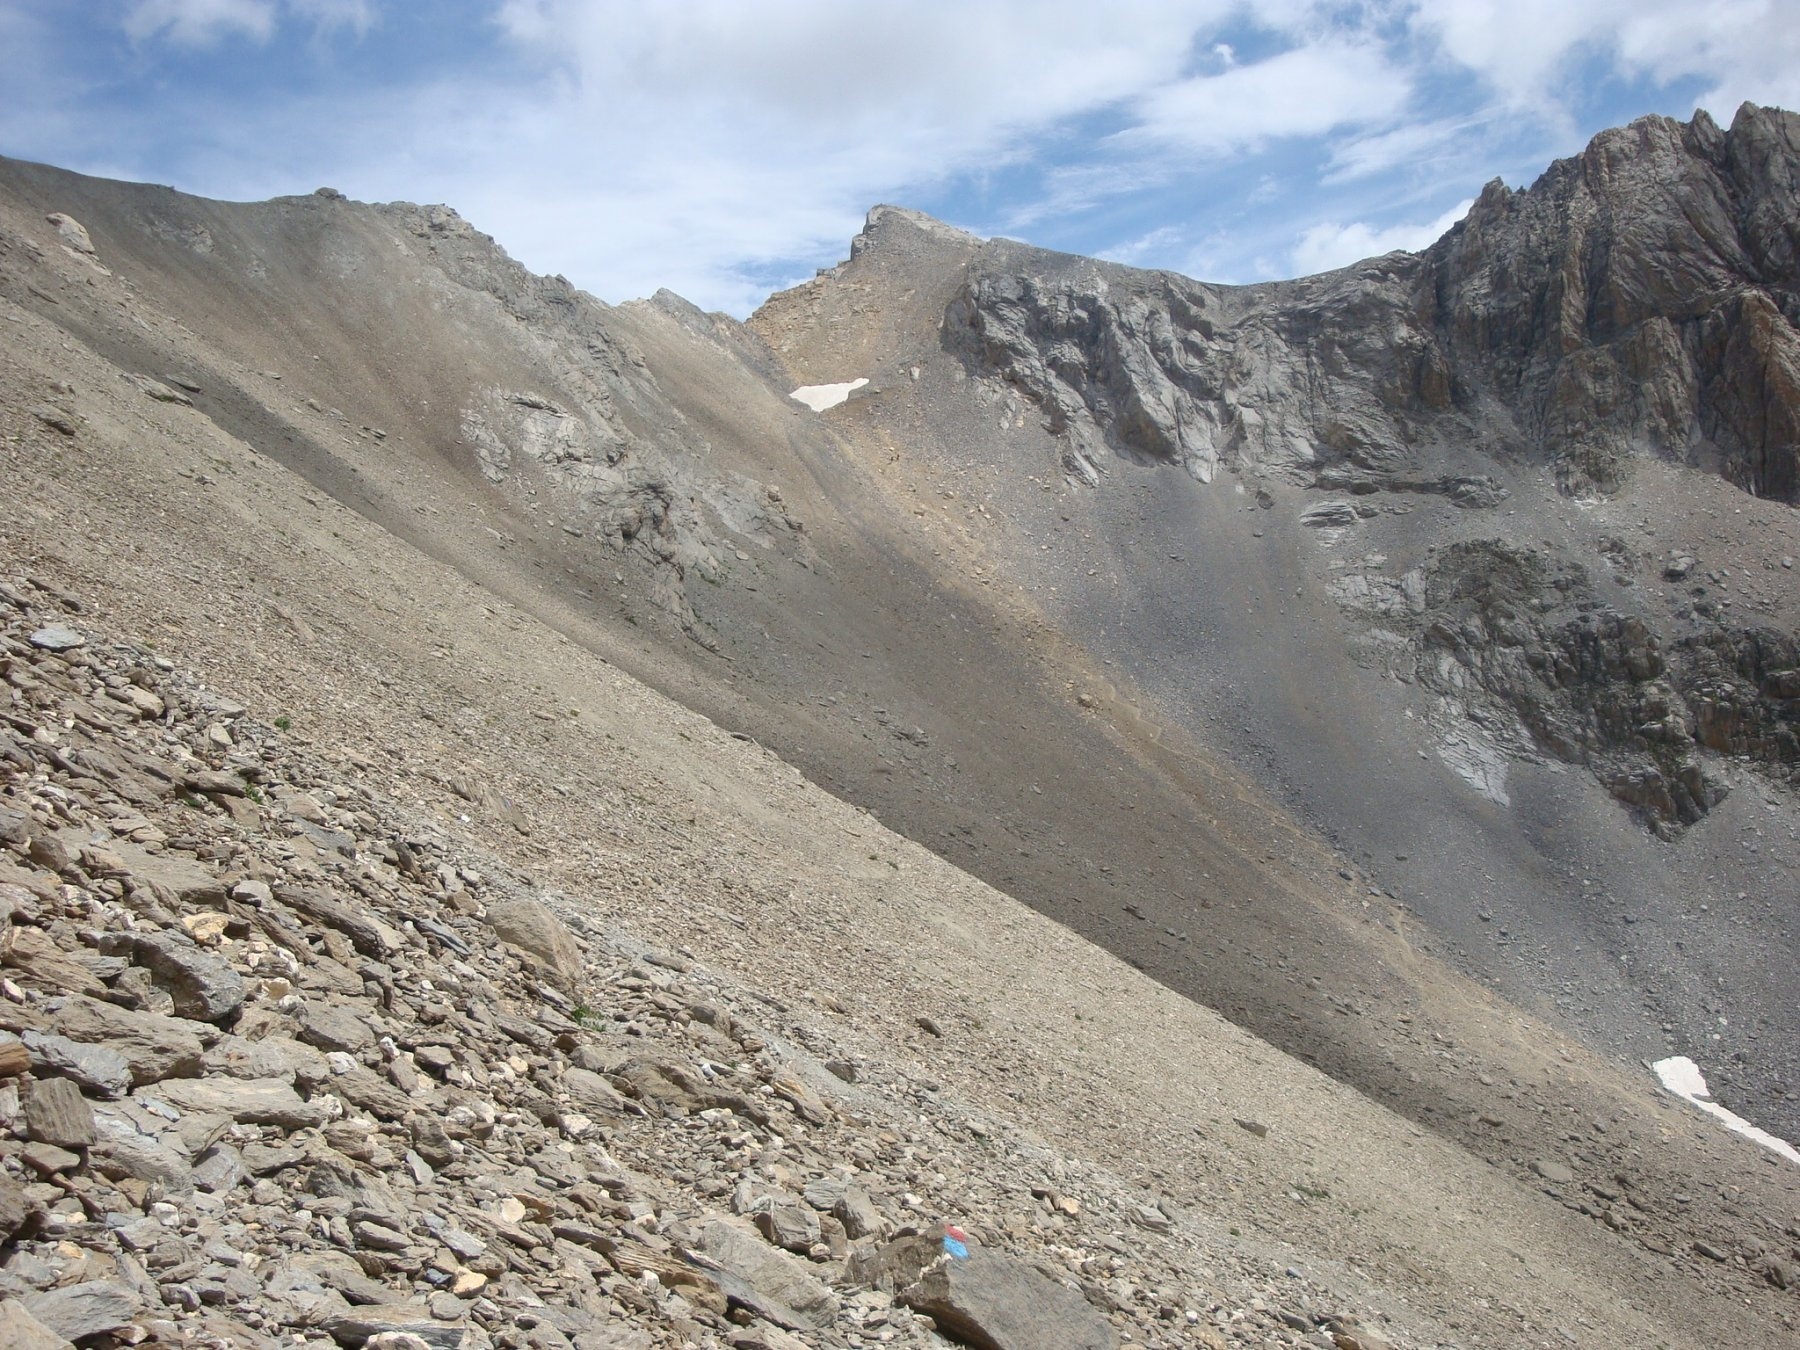 sentiero Cavallero e colle Ciaslaras sullo sfondo